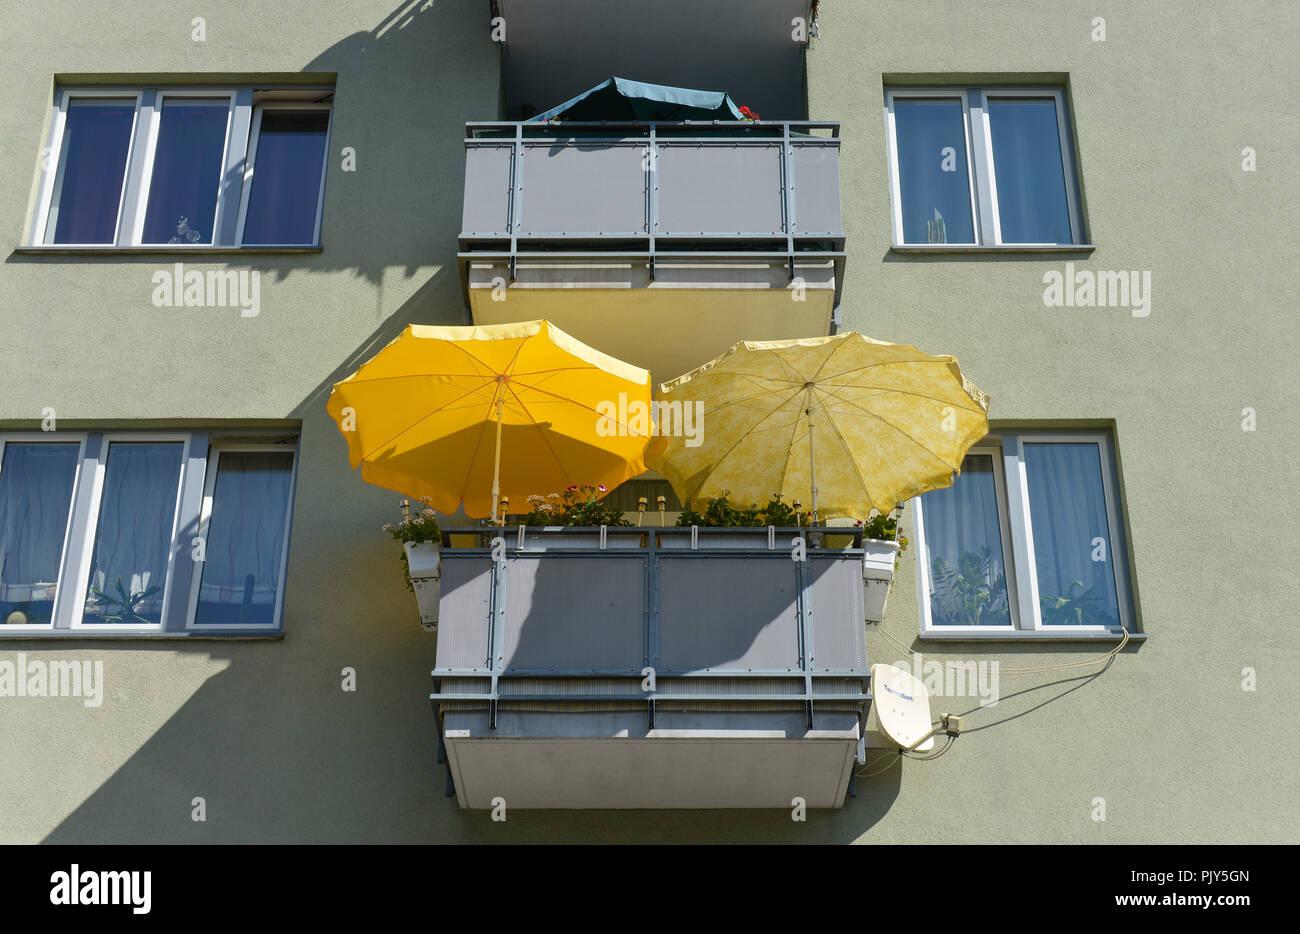 Balcony, sunshade, Gürtelstrasse, white lake, Pankow, Berlin